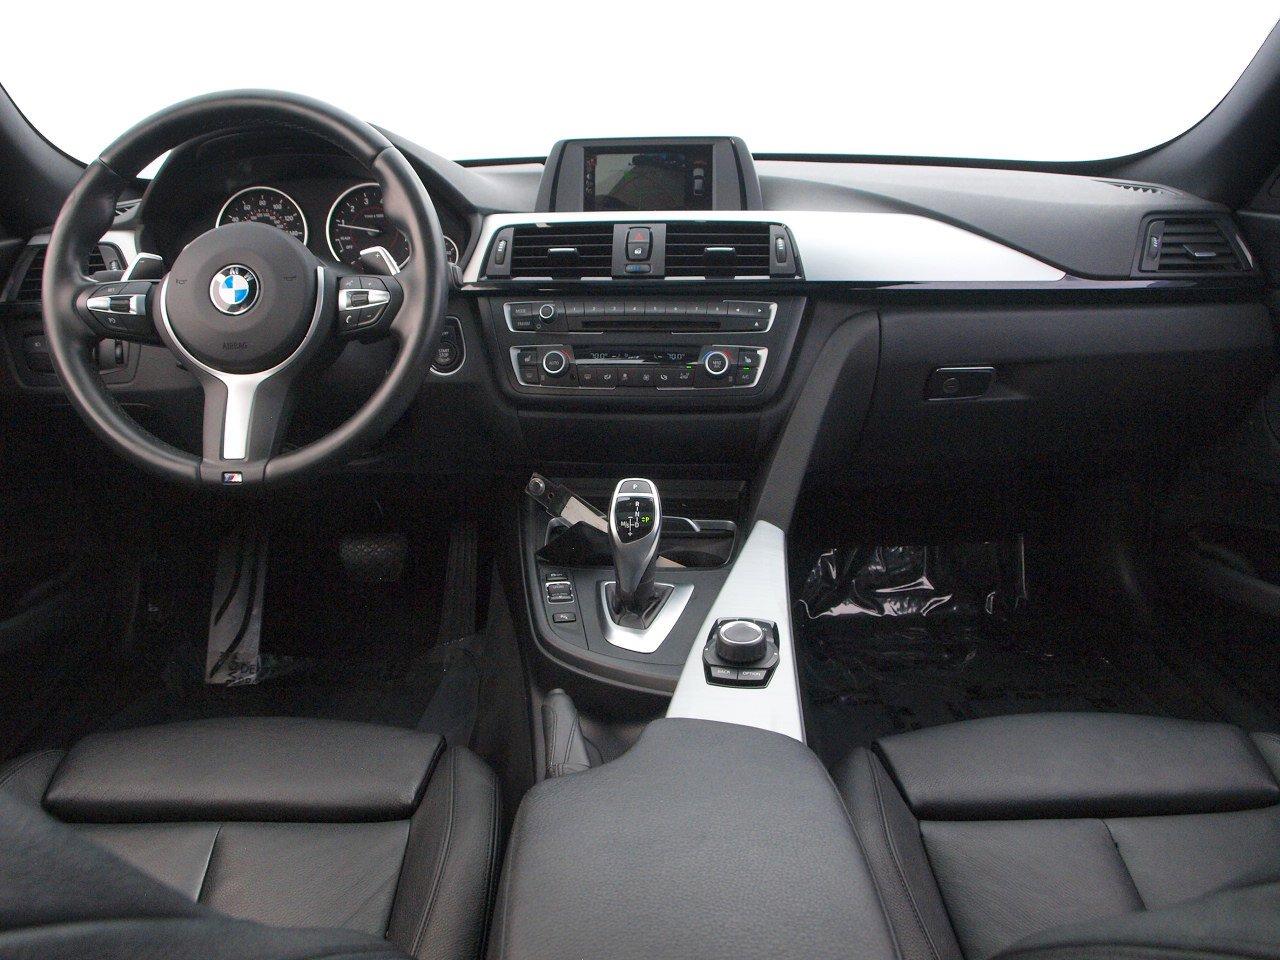 Pre-Owned 2016 BMW 3 Series Gran Turismo 328i xDrive